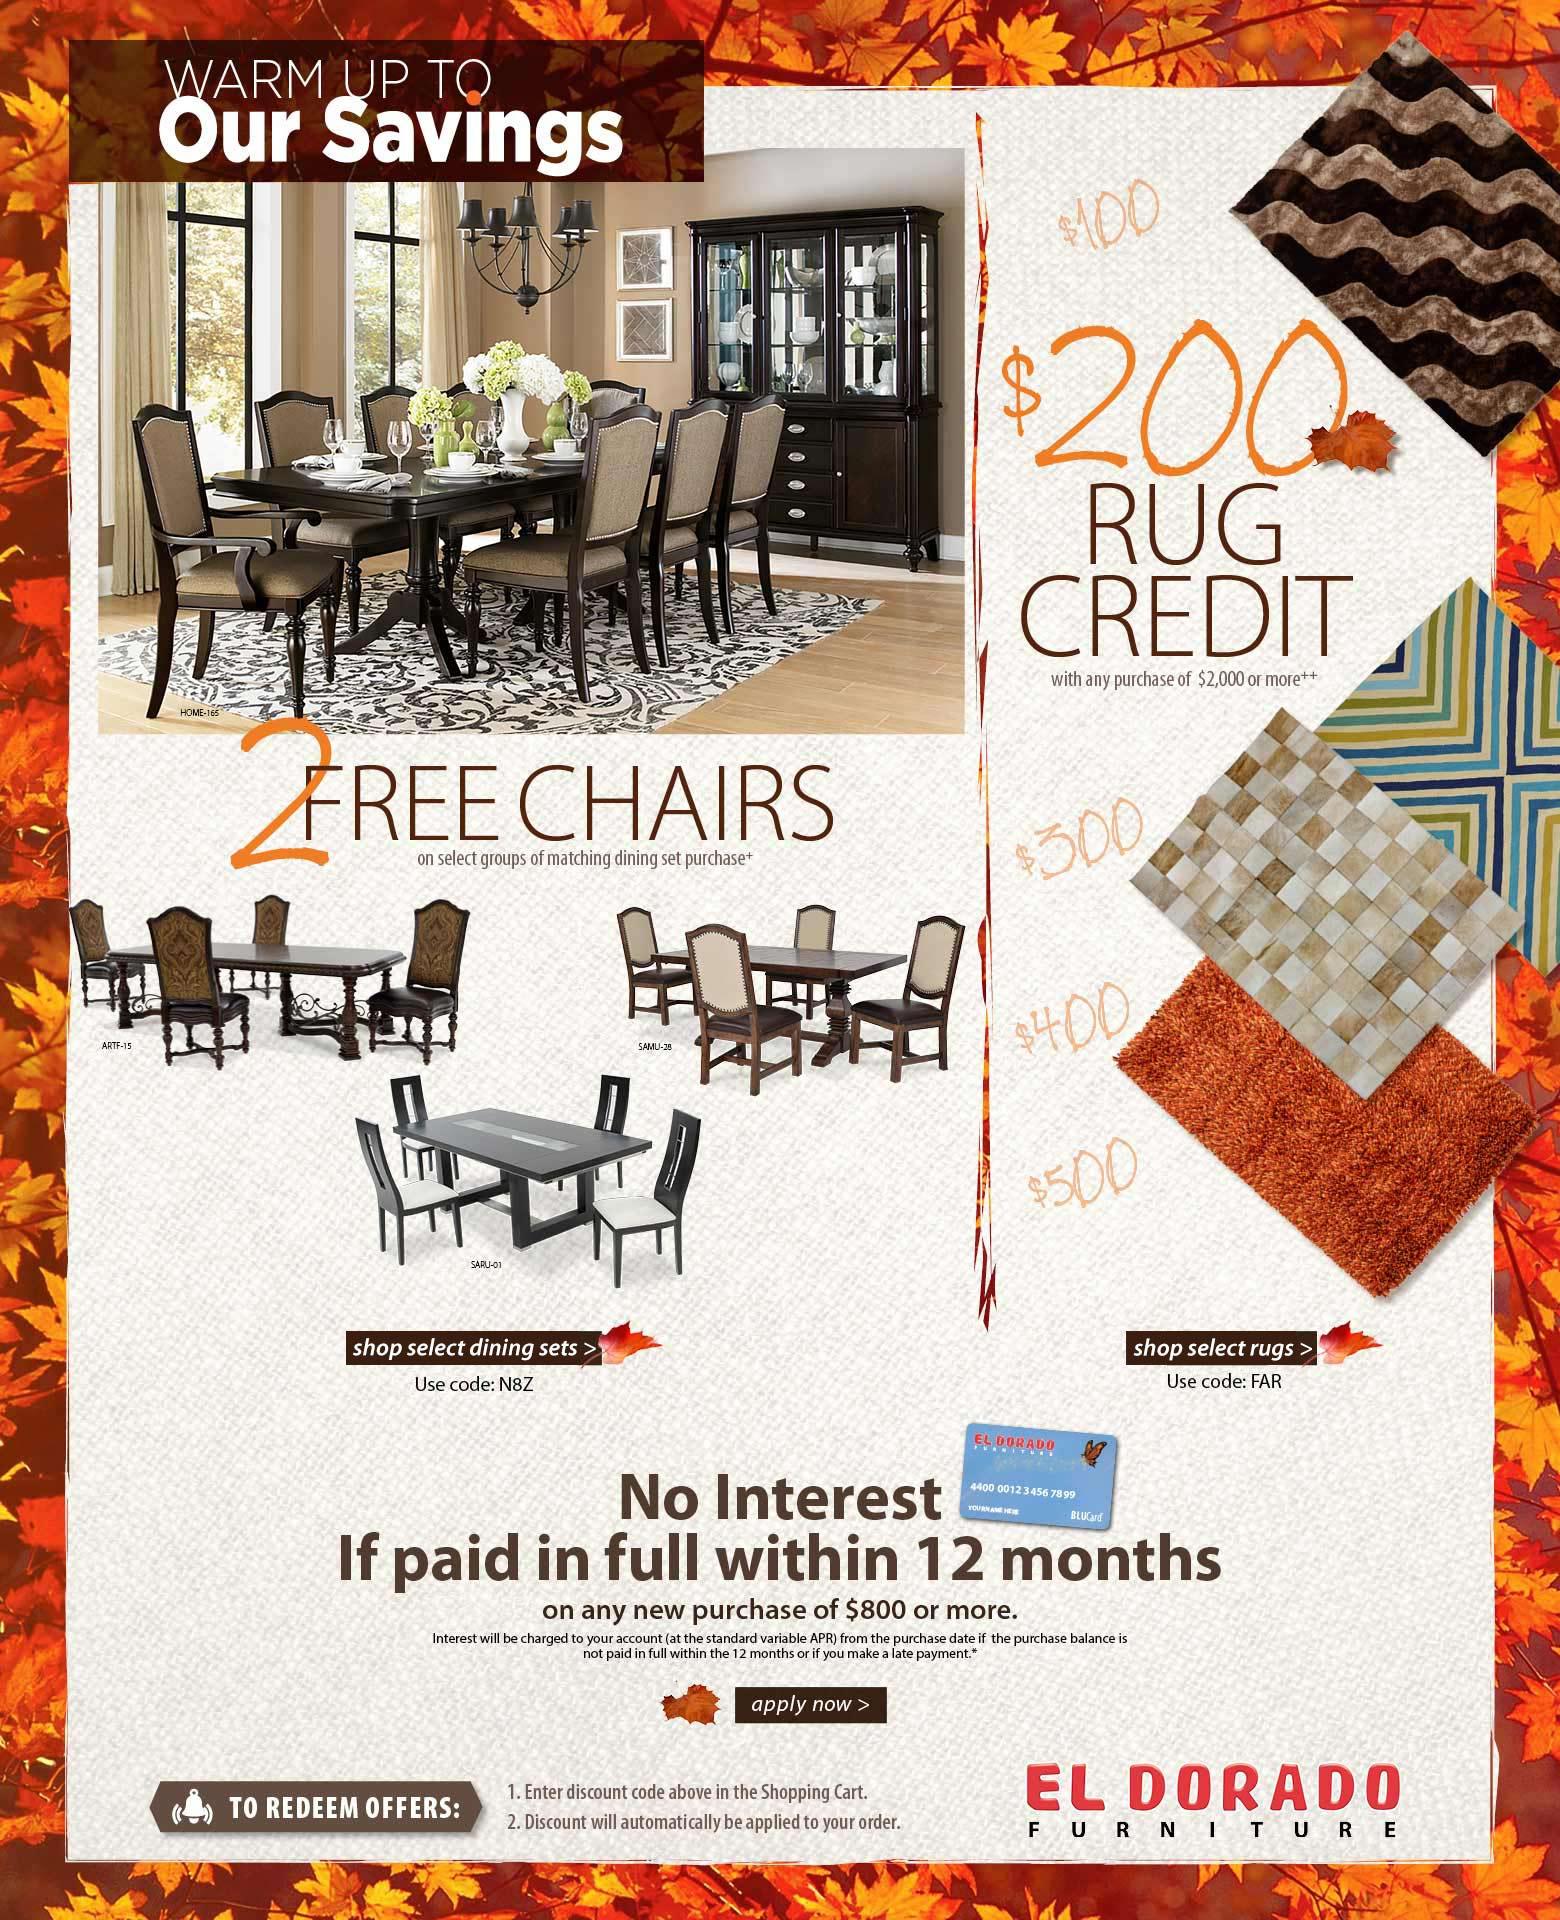 El Dorado Furniture Offers